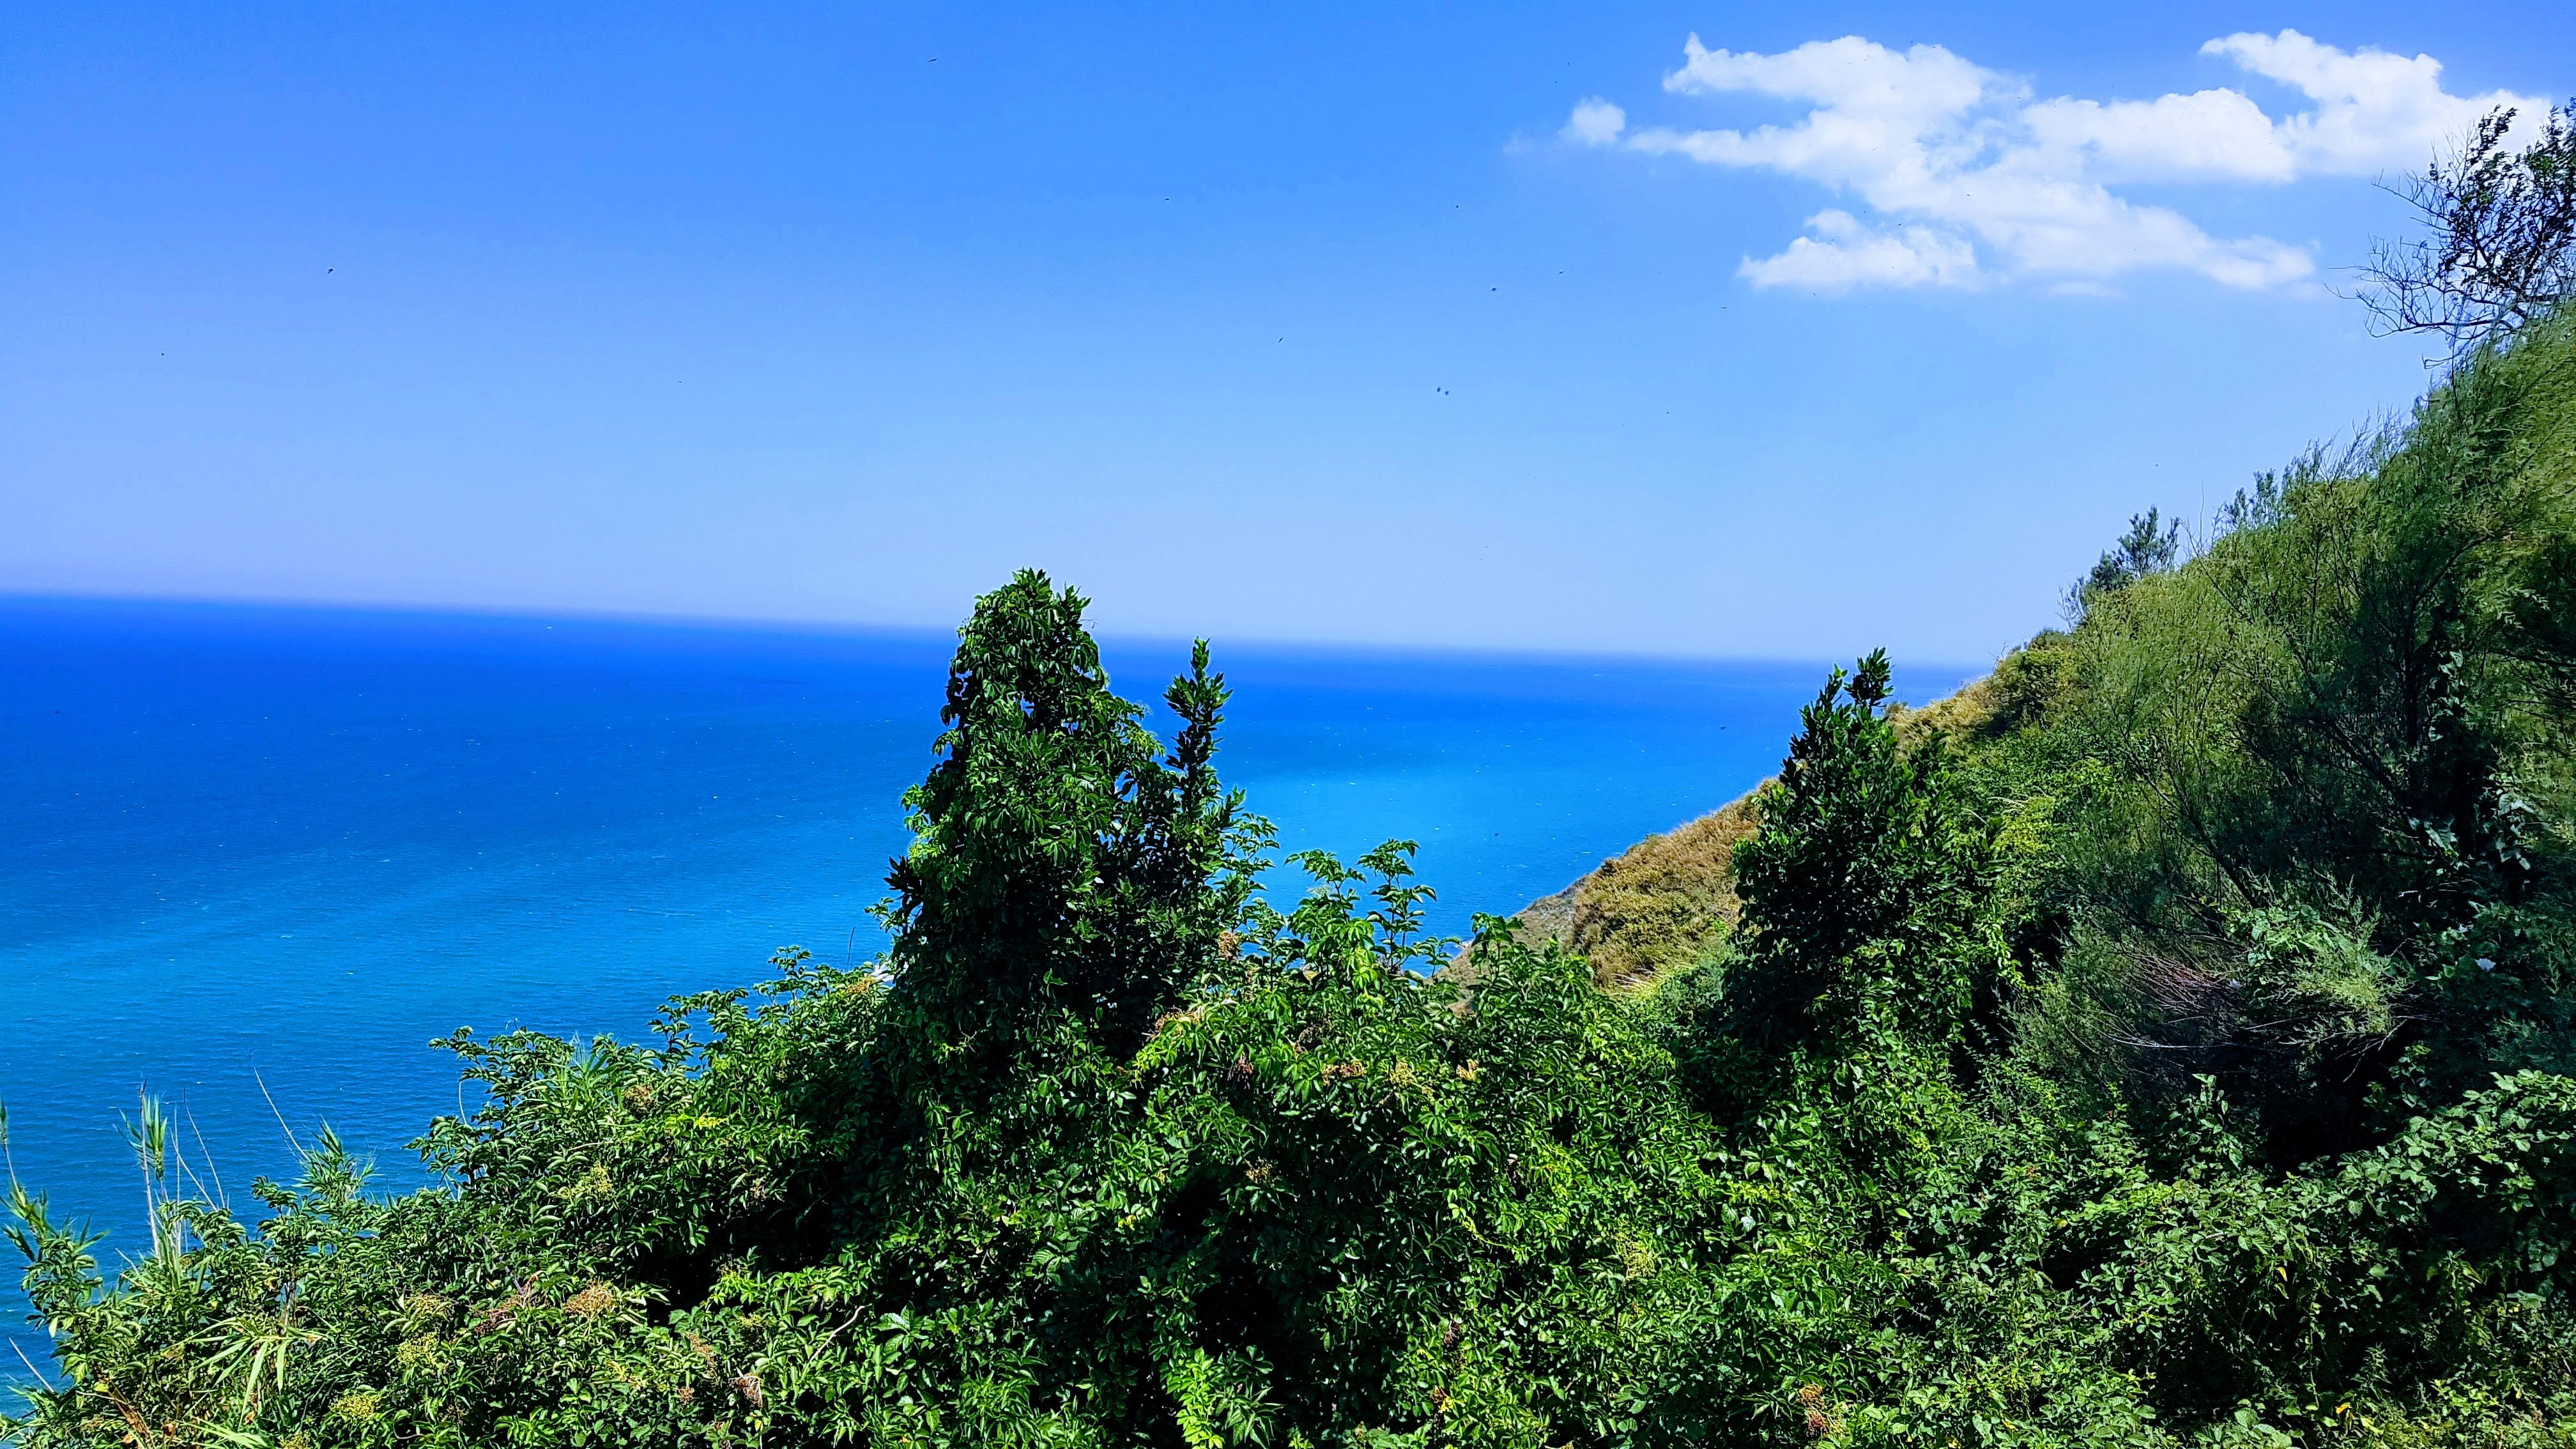 Naturpark San Bartolo - Blick auf die Adria